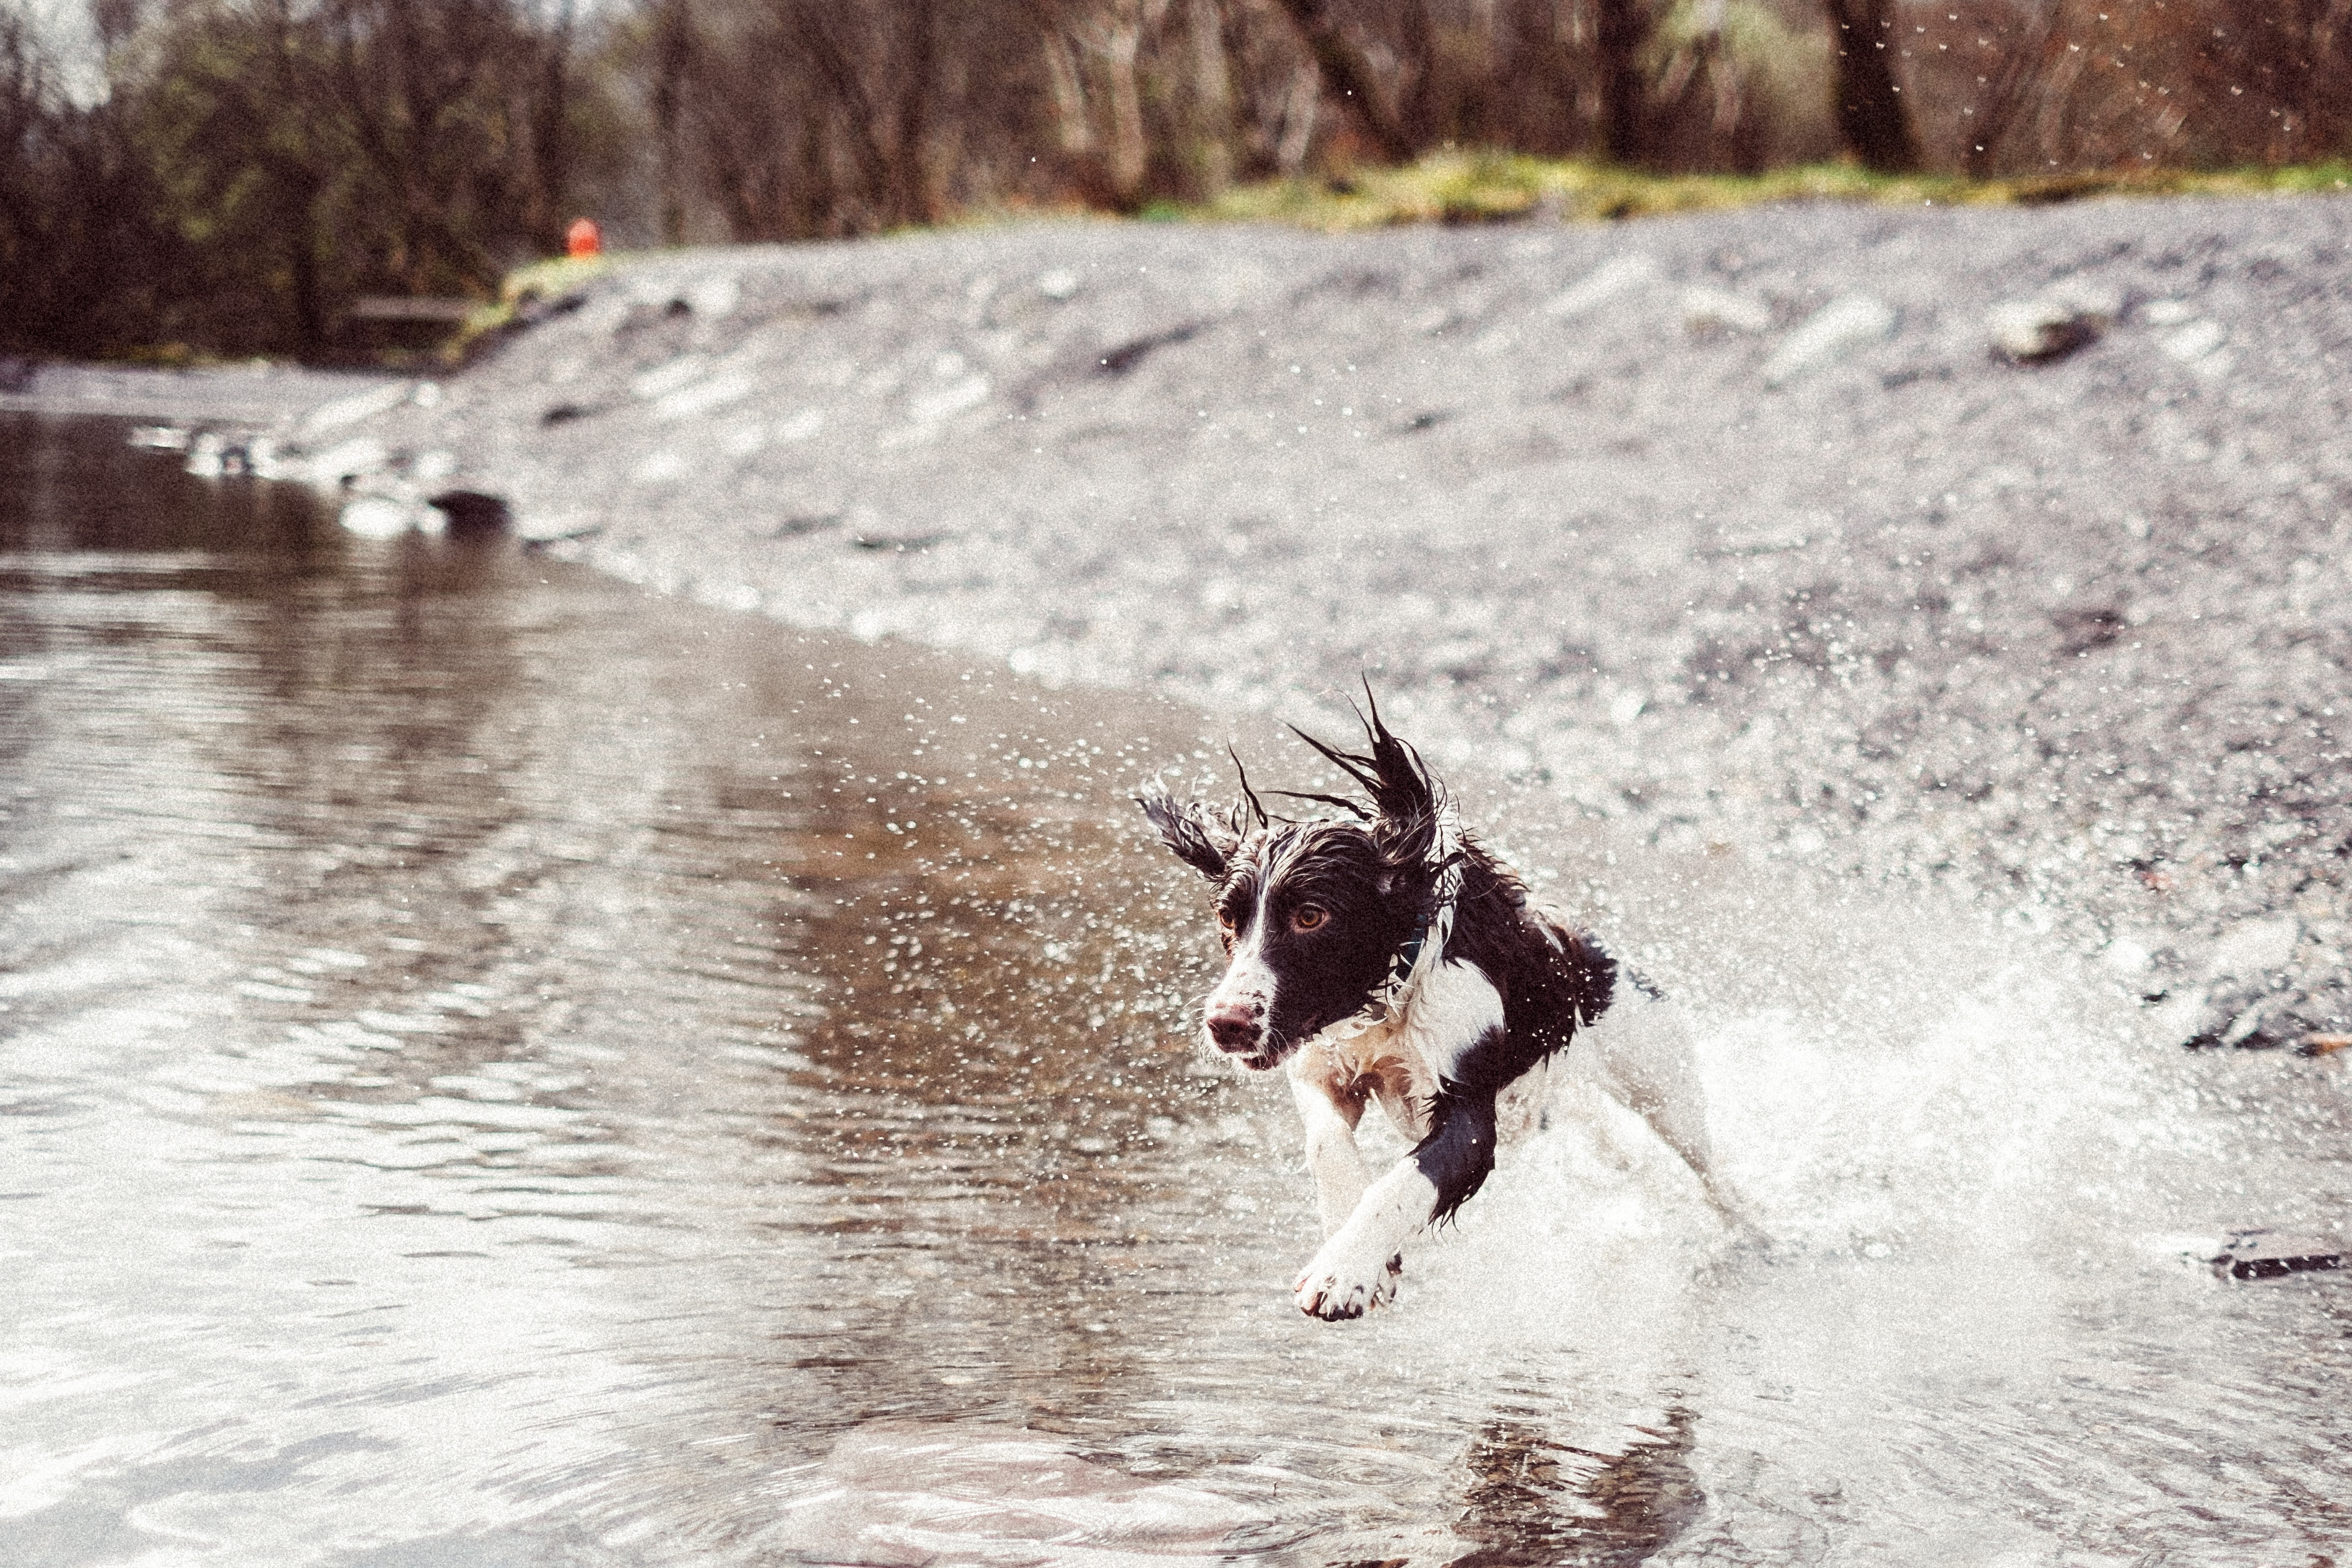 Zeckenprophylaxe, www.vetdogs.de, www.vet-dogs.de, online Tierarzt